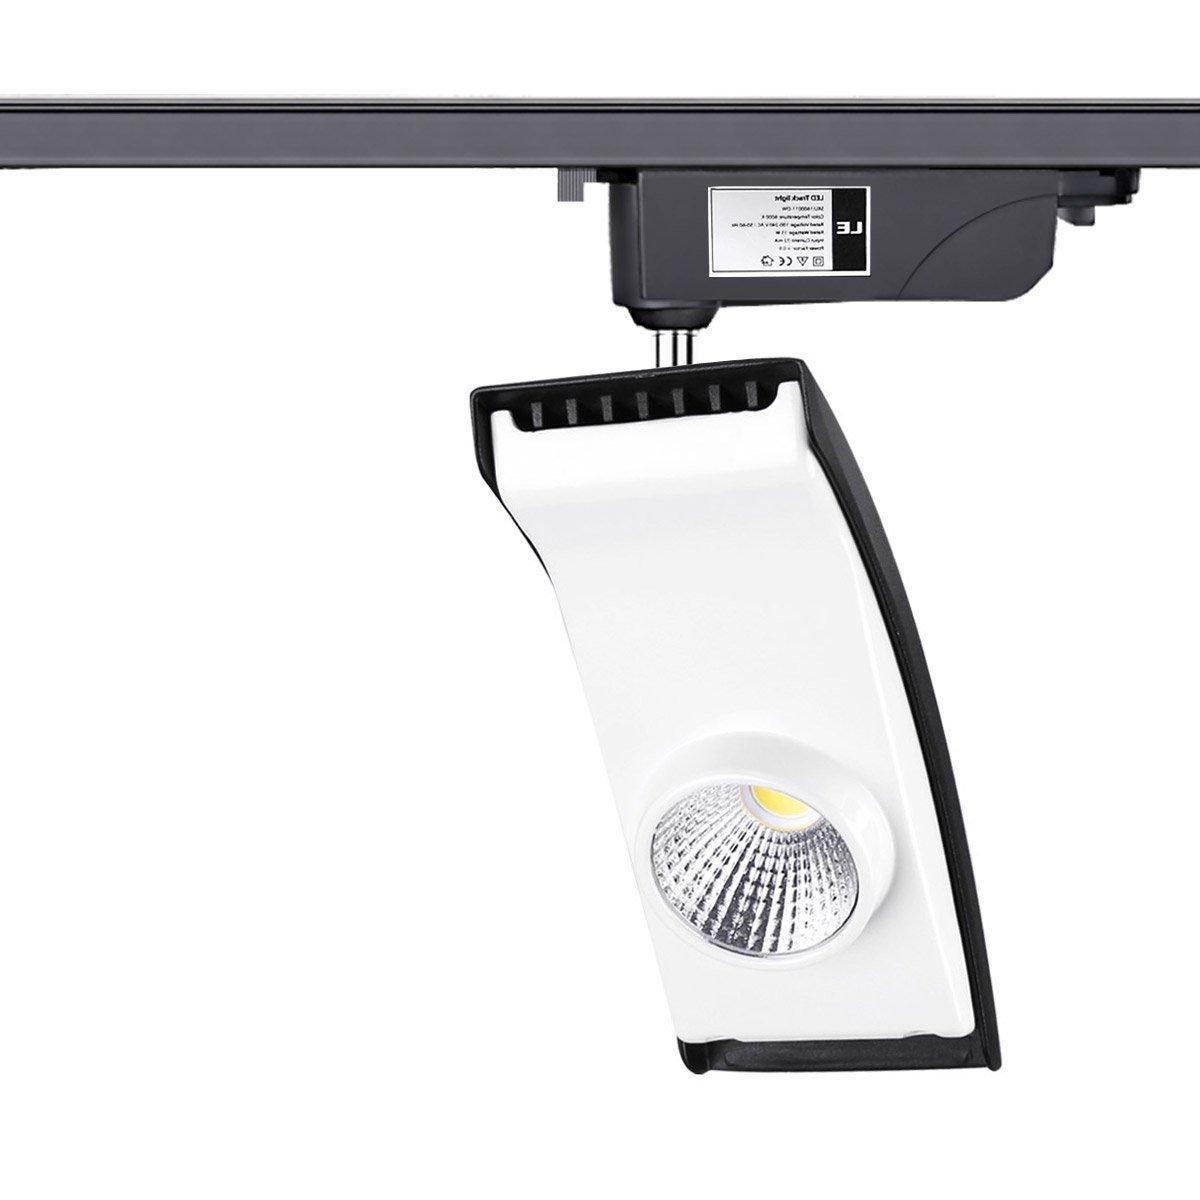 LE 15W LED Track Lighting 100W Halogen Bulbs Equivalent 850lm R9u003e95 Warm White 3000K 30° Beam Angle Spotlights 3-wire Track Lights ...  sc 1 st  Amazon.com & LE 15W LED Track Lighting 100W Halogen Bulbs Equivalent 850lm ... azcodes.com